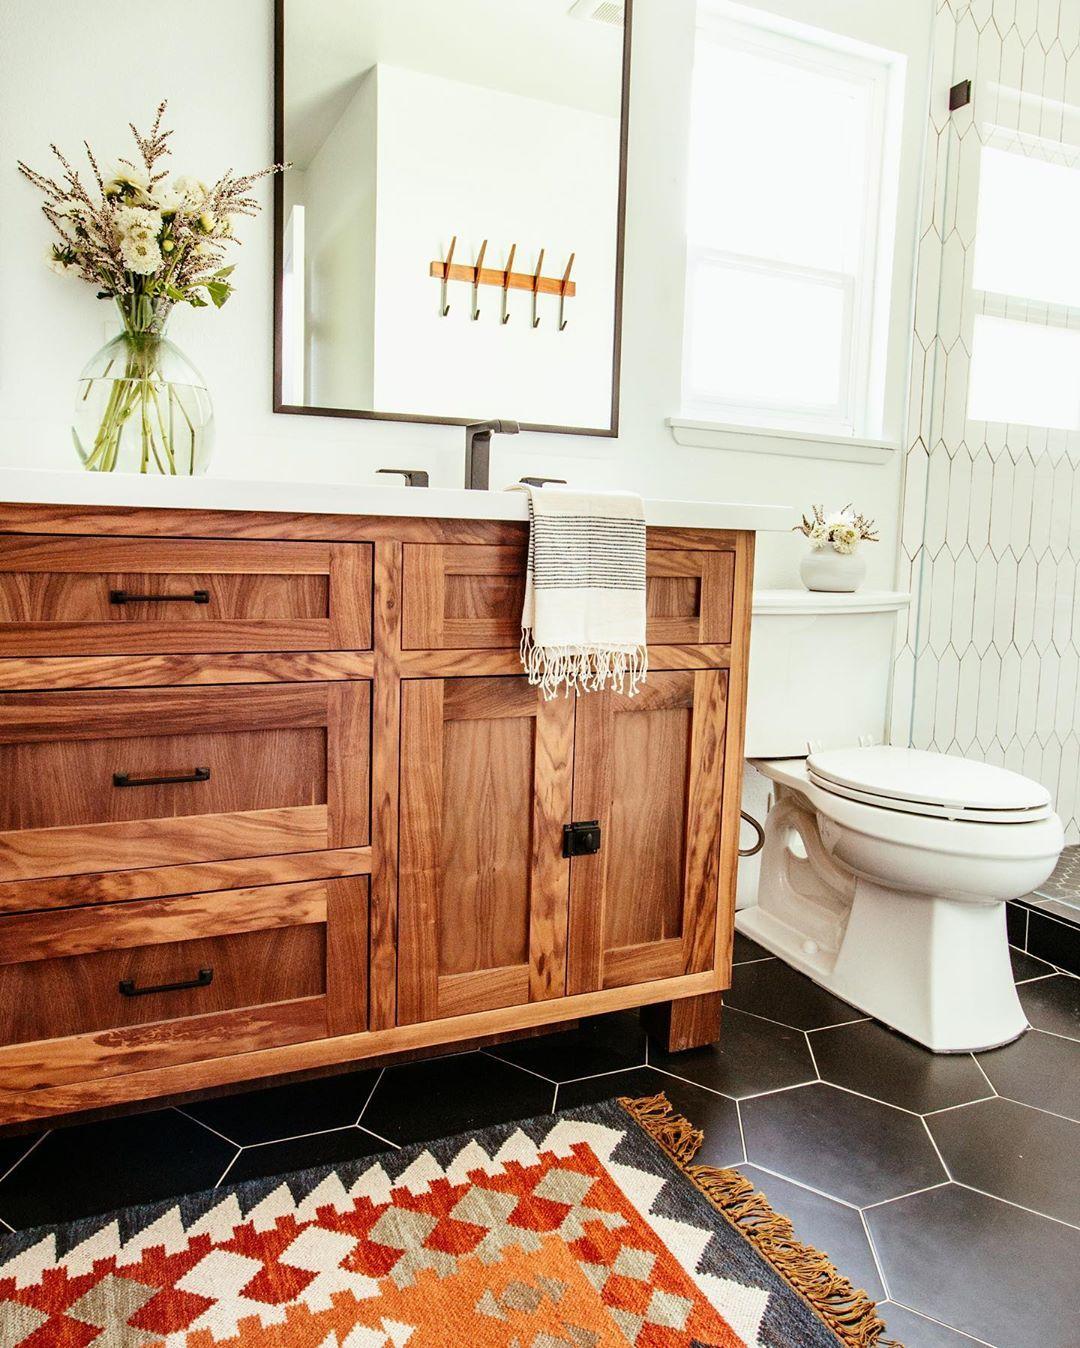 California Casual Bathroom In 2020 Mold In Bathroom Cheap Bathroom Remodel Bathroom Tile Inspiration